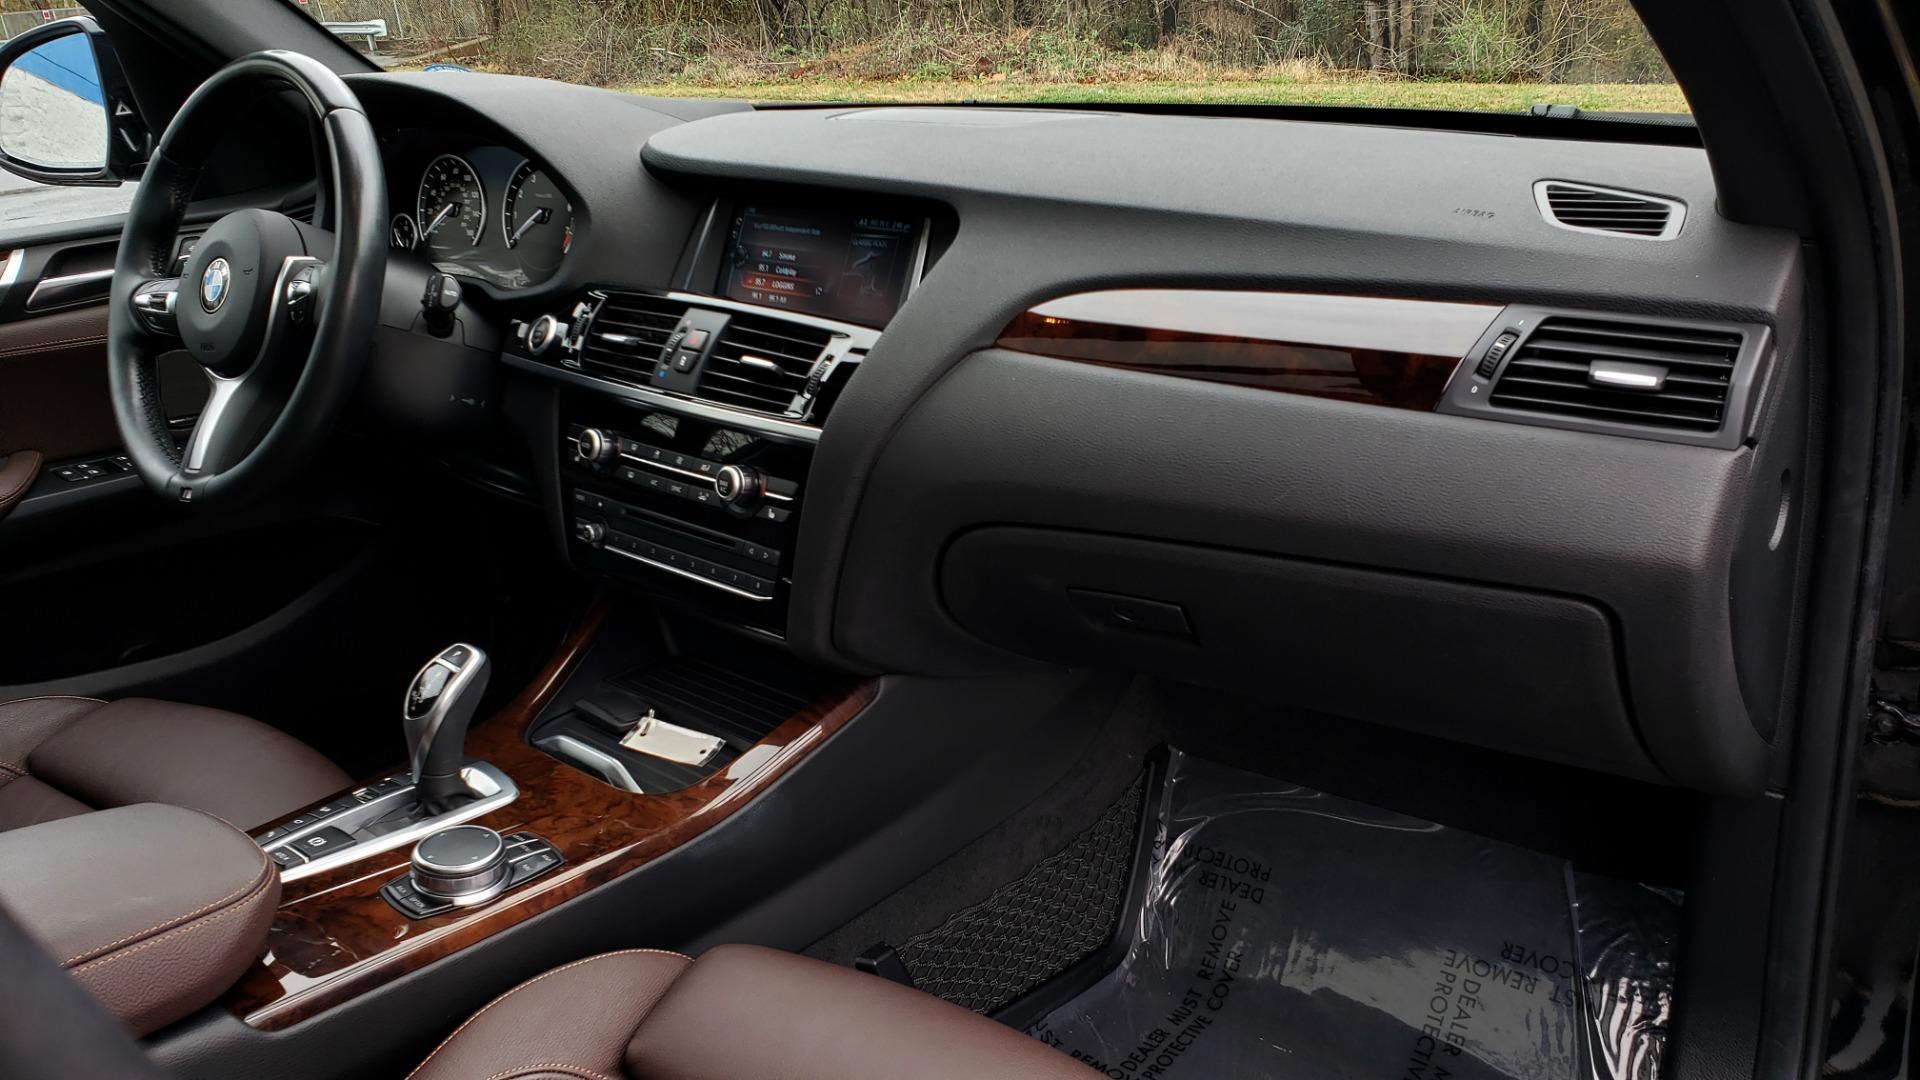 Used 2017 BMW X3 XDRIVE35I M-SPORT / DRVR ASST PLUS / TECHNOLOGY / HUD / BLIND SPOT for sale Sold at Formula Imports in Charlotte NC 28227 65